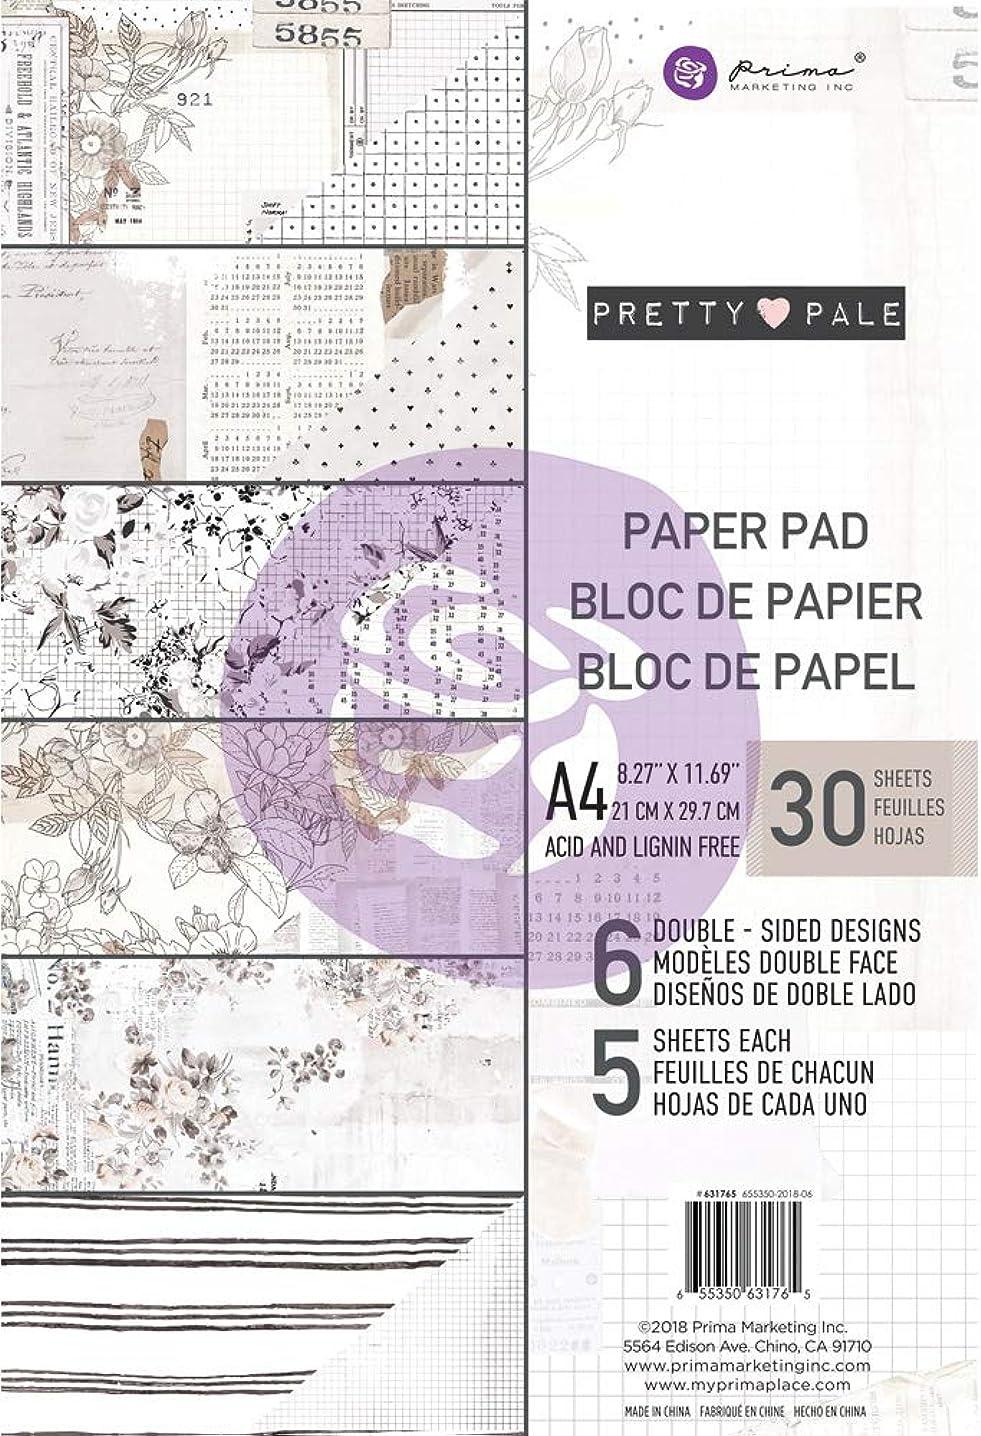 Prima Marketing 631765 Double-Sided Paper Pad A4 30/Pkg-Pretty Pale, 6 Designs/5